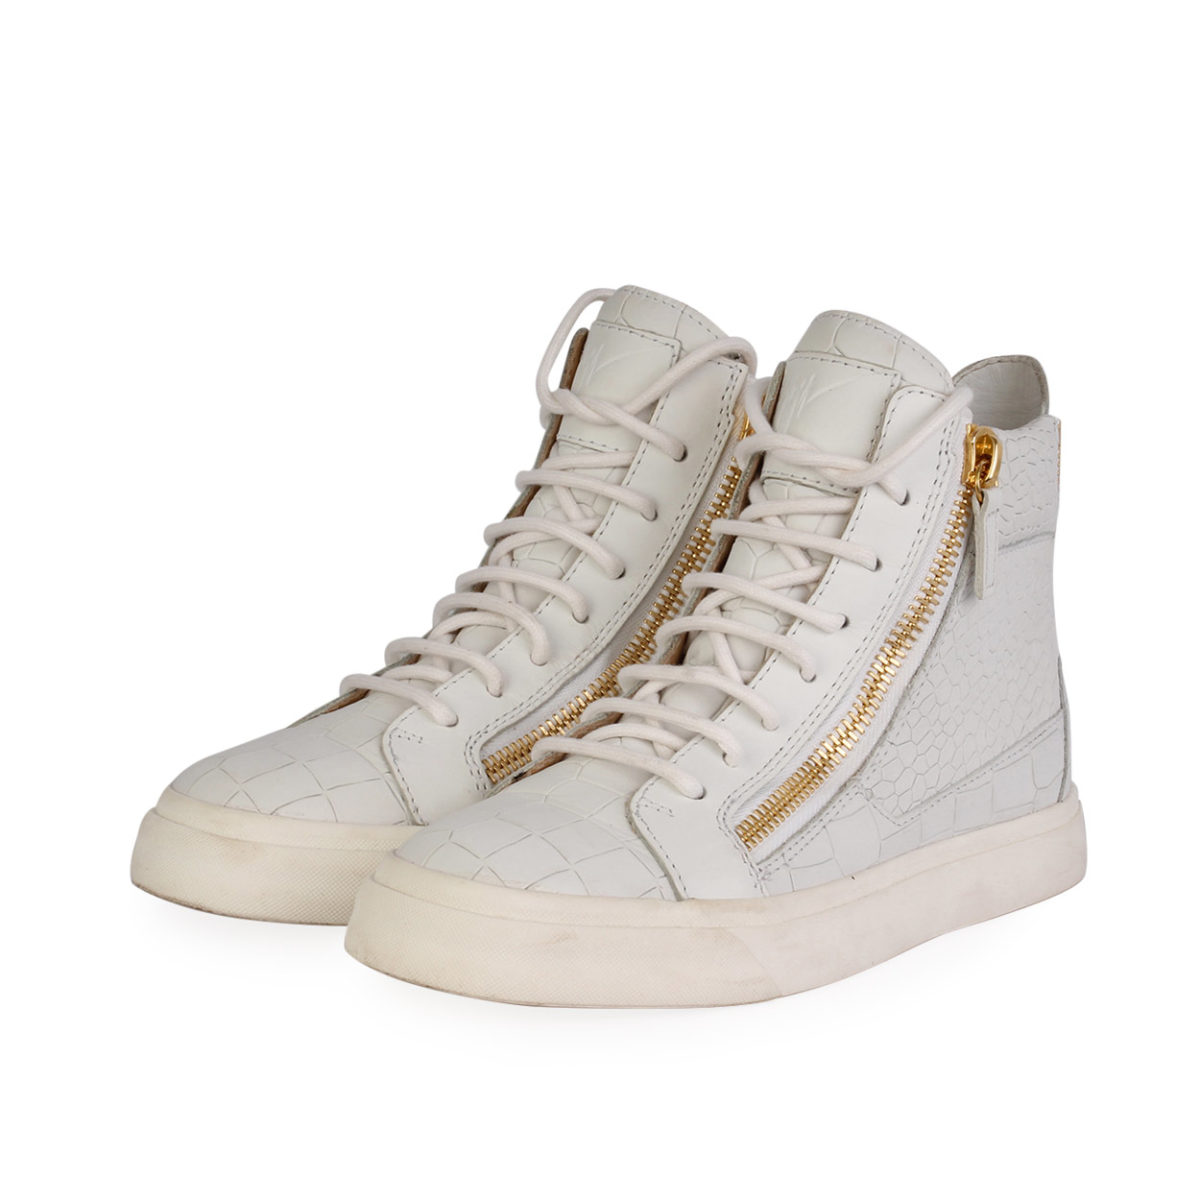 2de3ad5bde GIUSEPPE ZANOTTI Leather High Top Sneakers White - S: 36 (3.5)